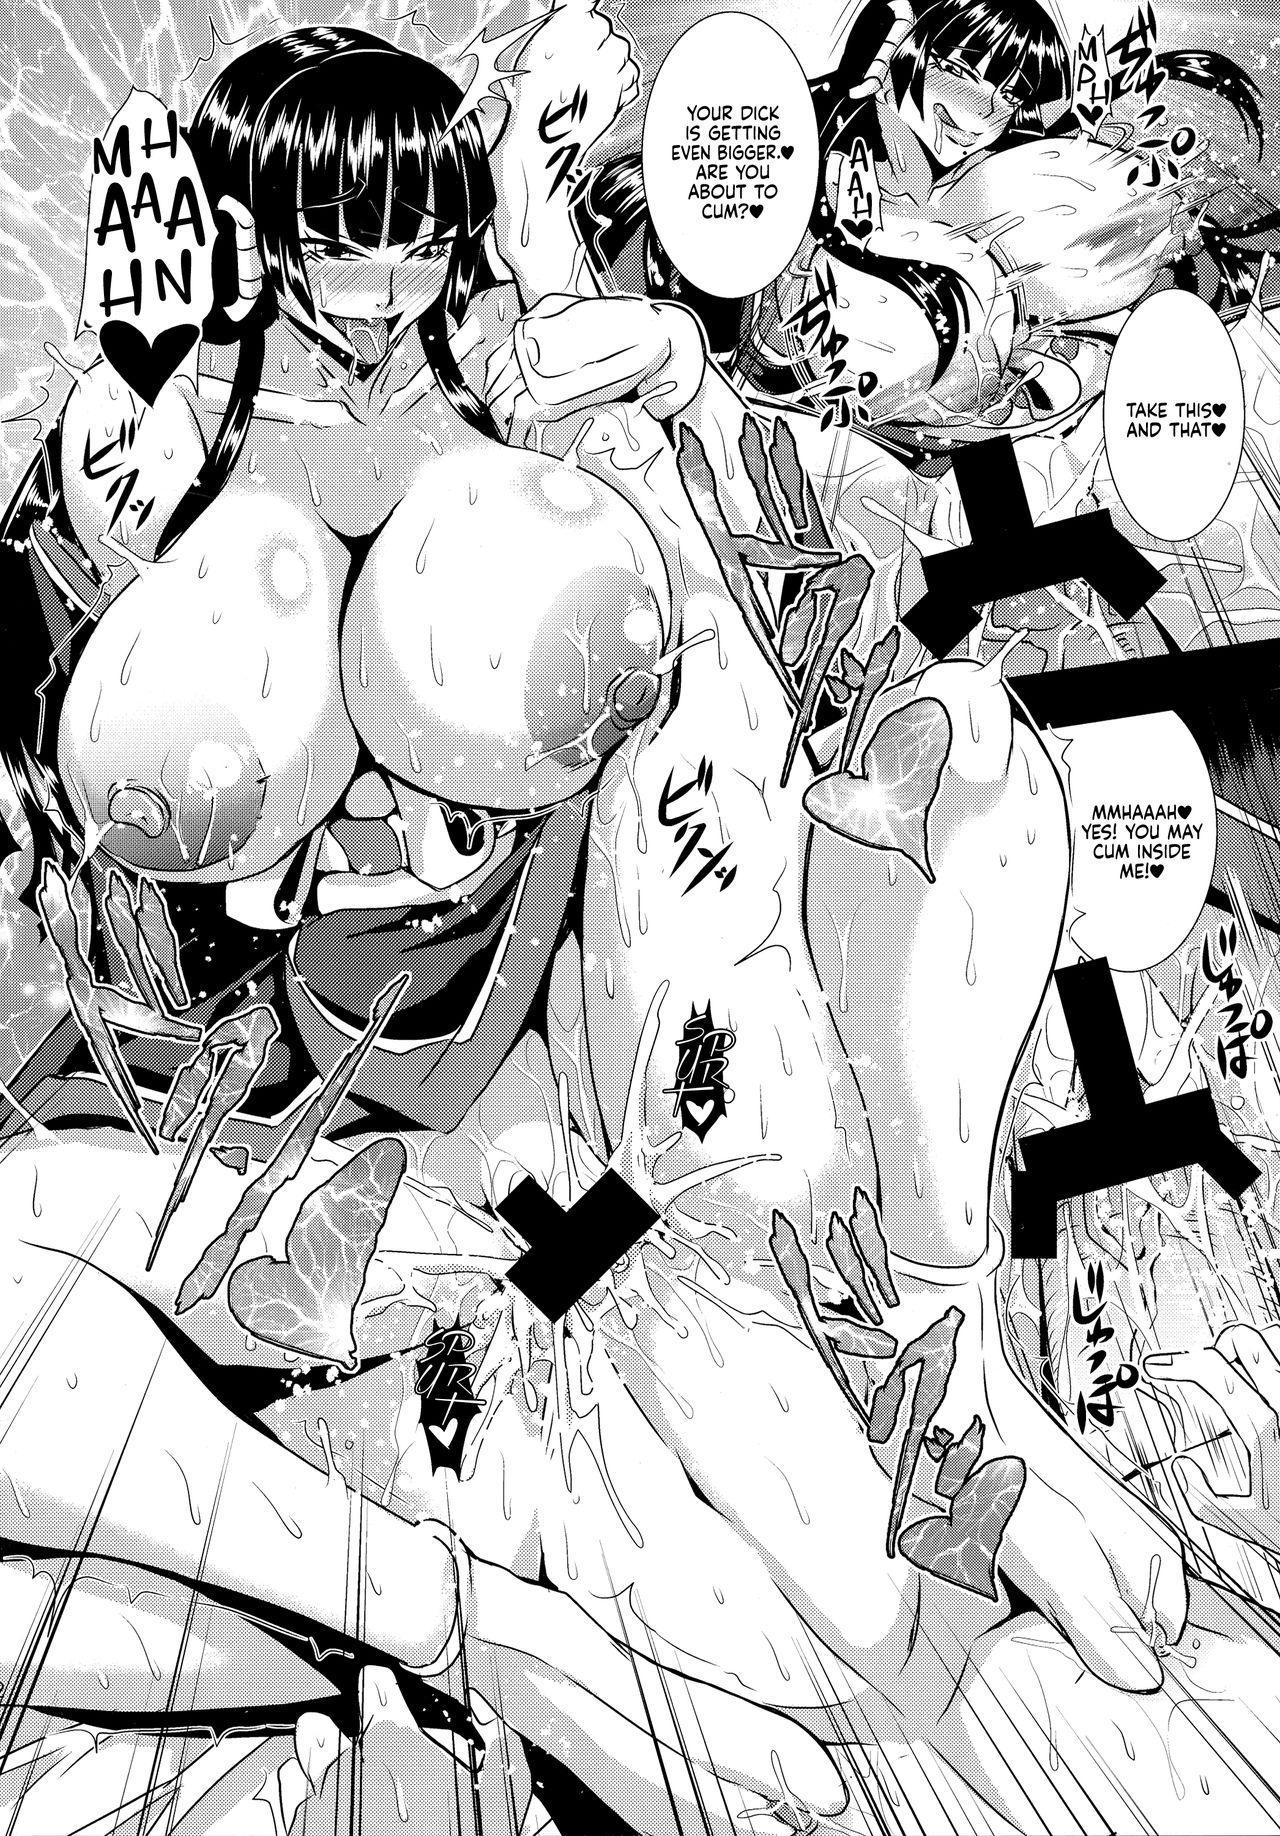 Miyama no Nyotengu-sama. | The female tengu of mount Miyama. 11